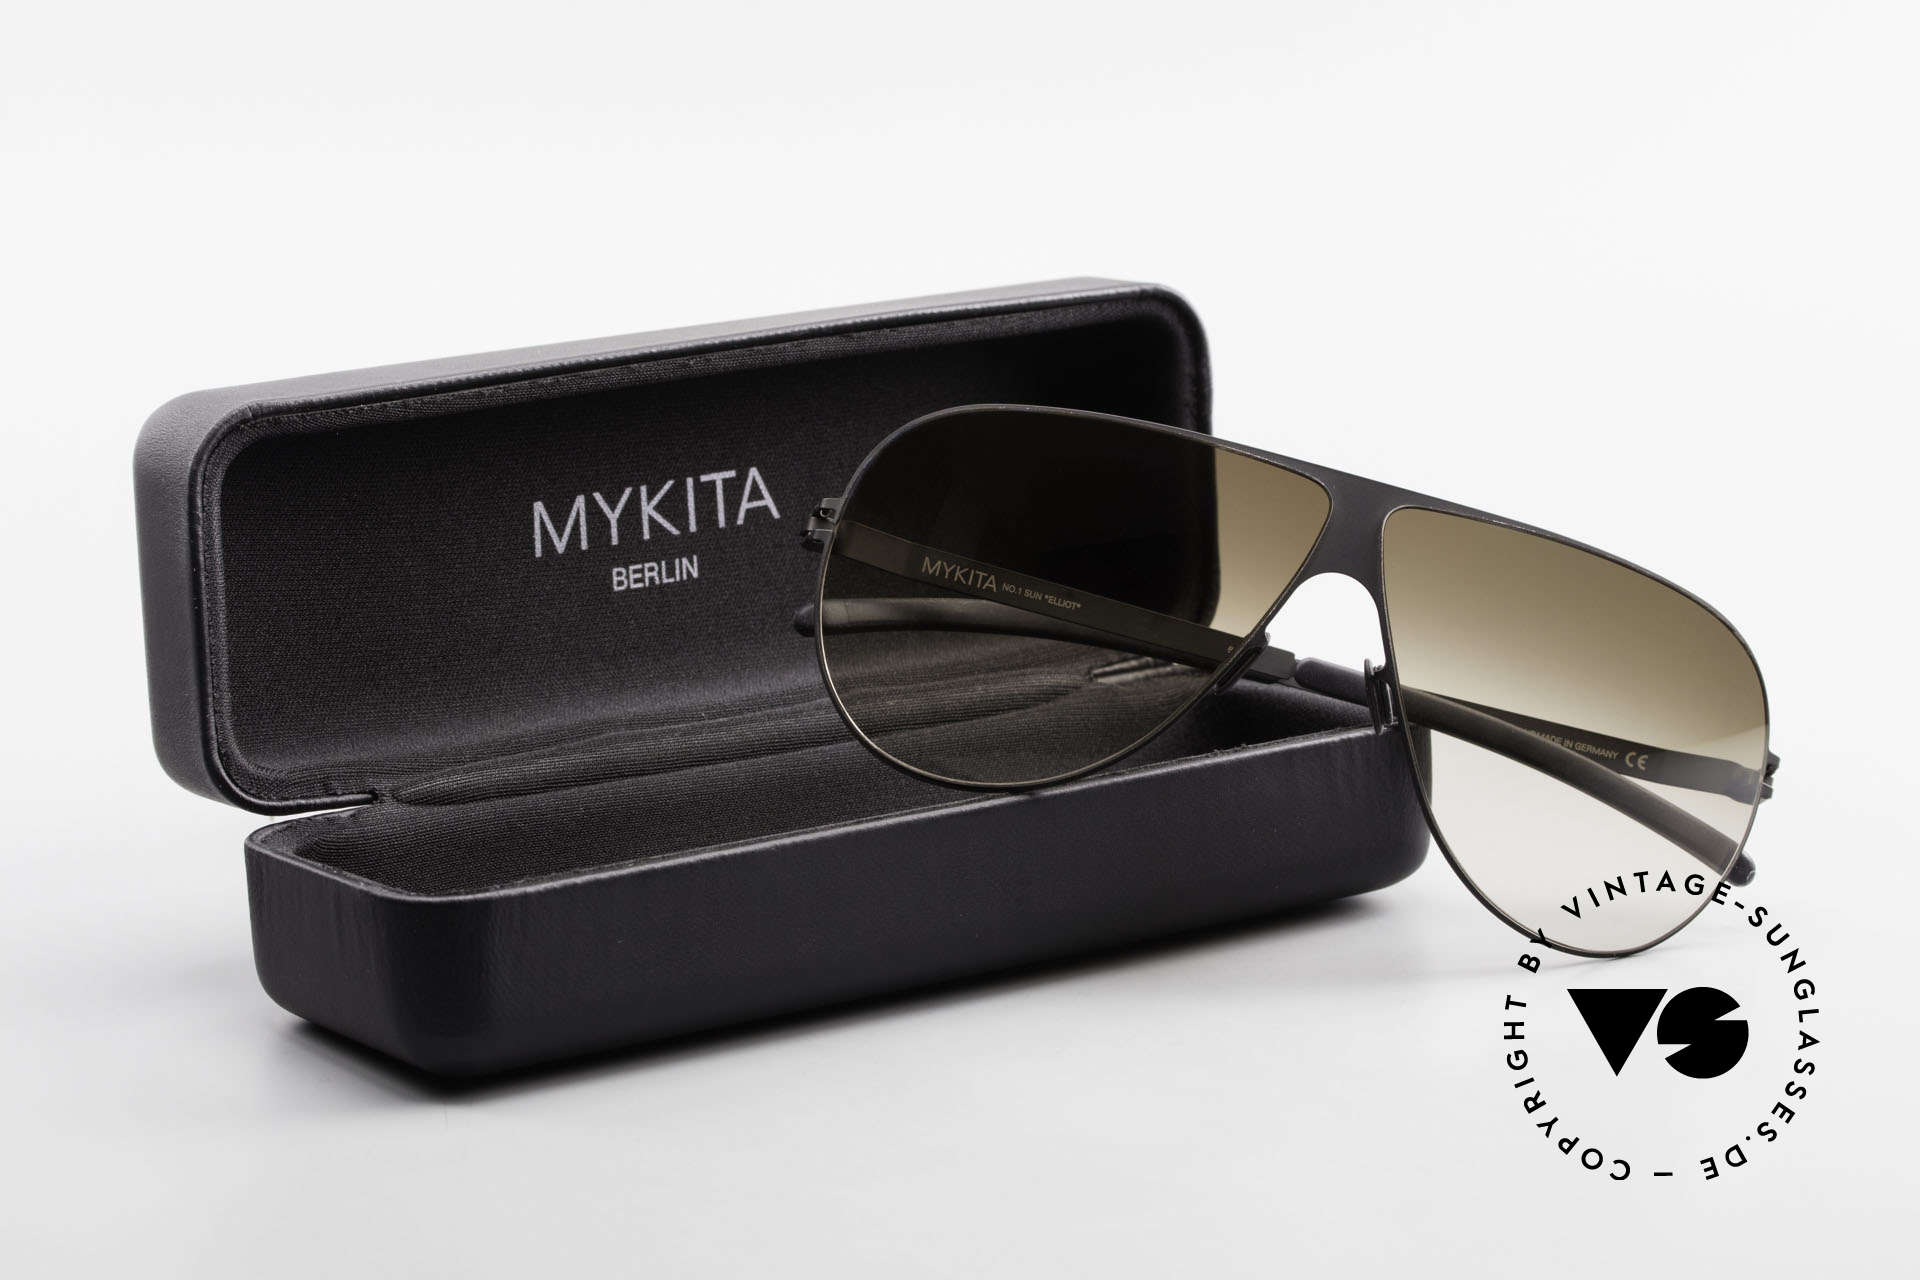 Mykita Elliot Mykita Tom Cruise Sunglasses, Size: medium, Made for Men